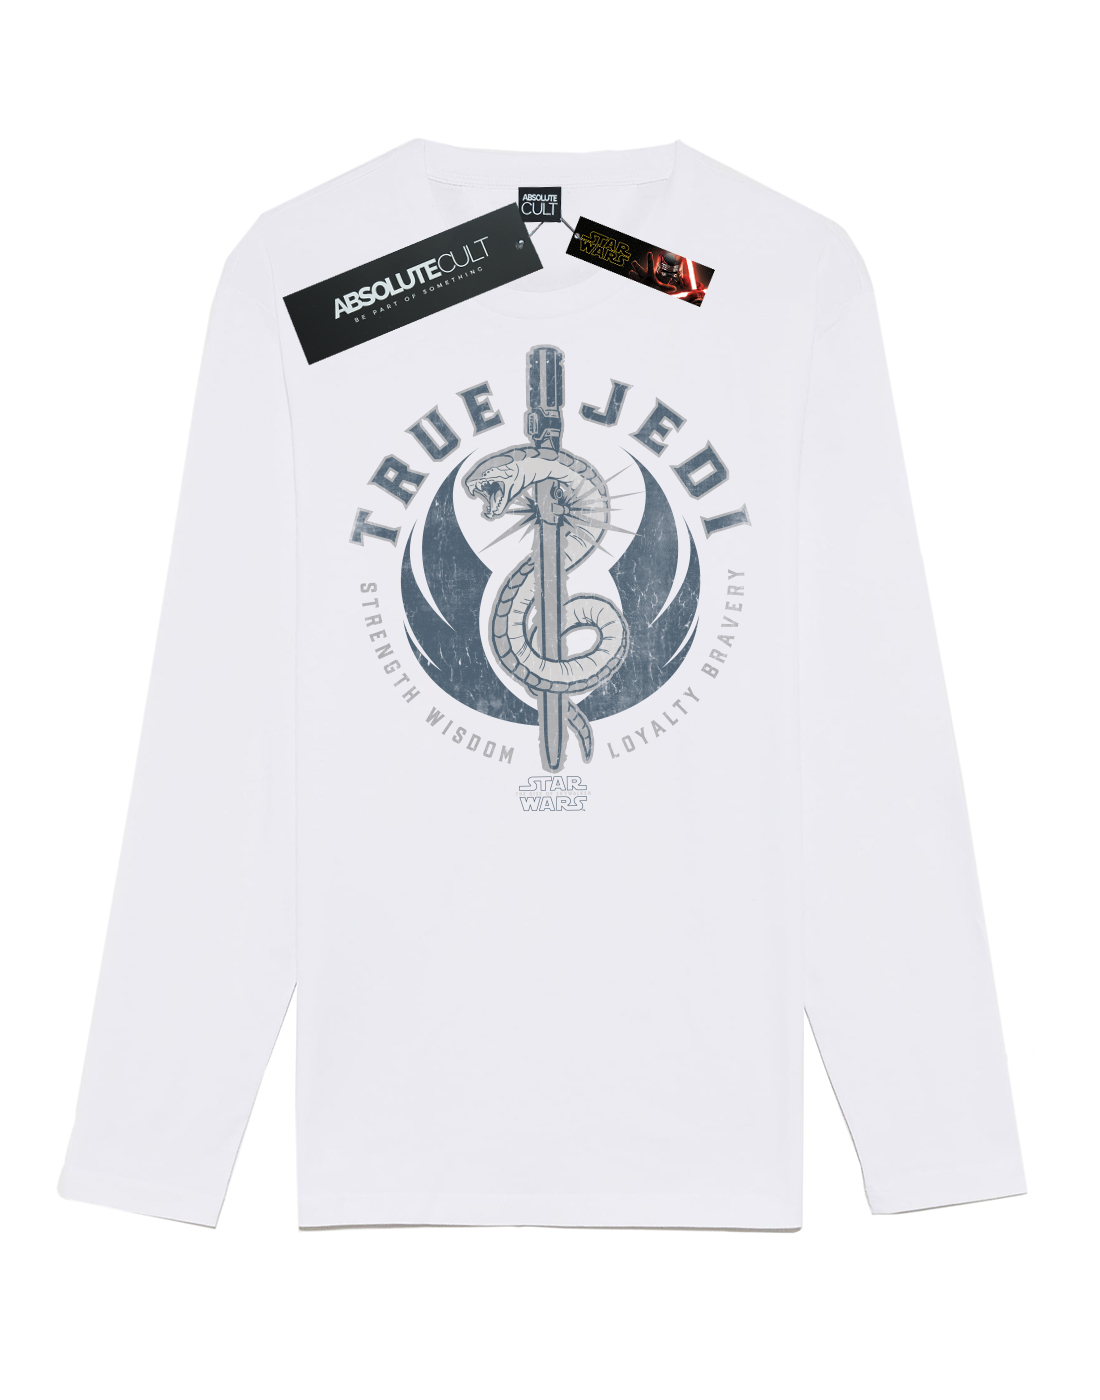 Star-Wars-para-hombre-el-aumento-de-Skywalker-verdadero-Jedi-azul-de-manga-larga-T-Shirt miniatura 8